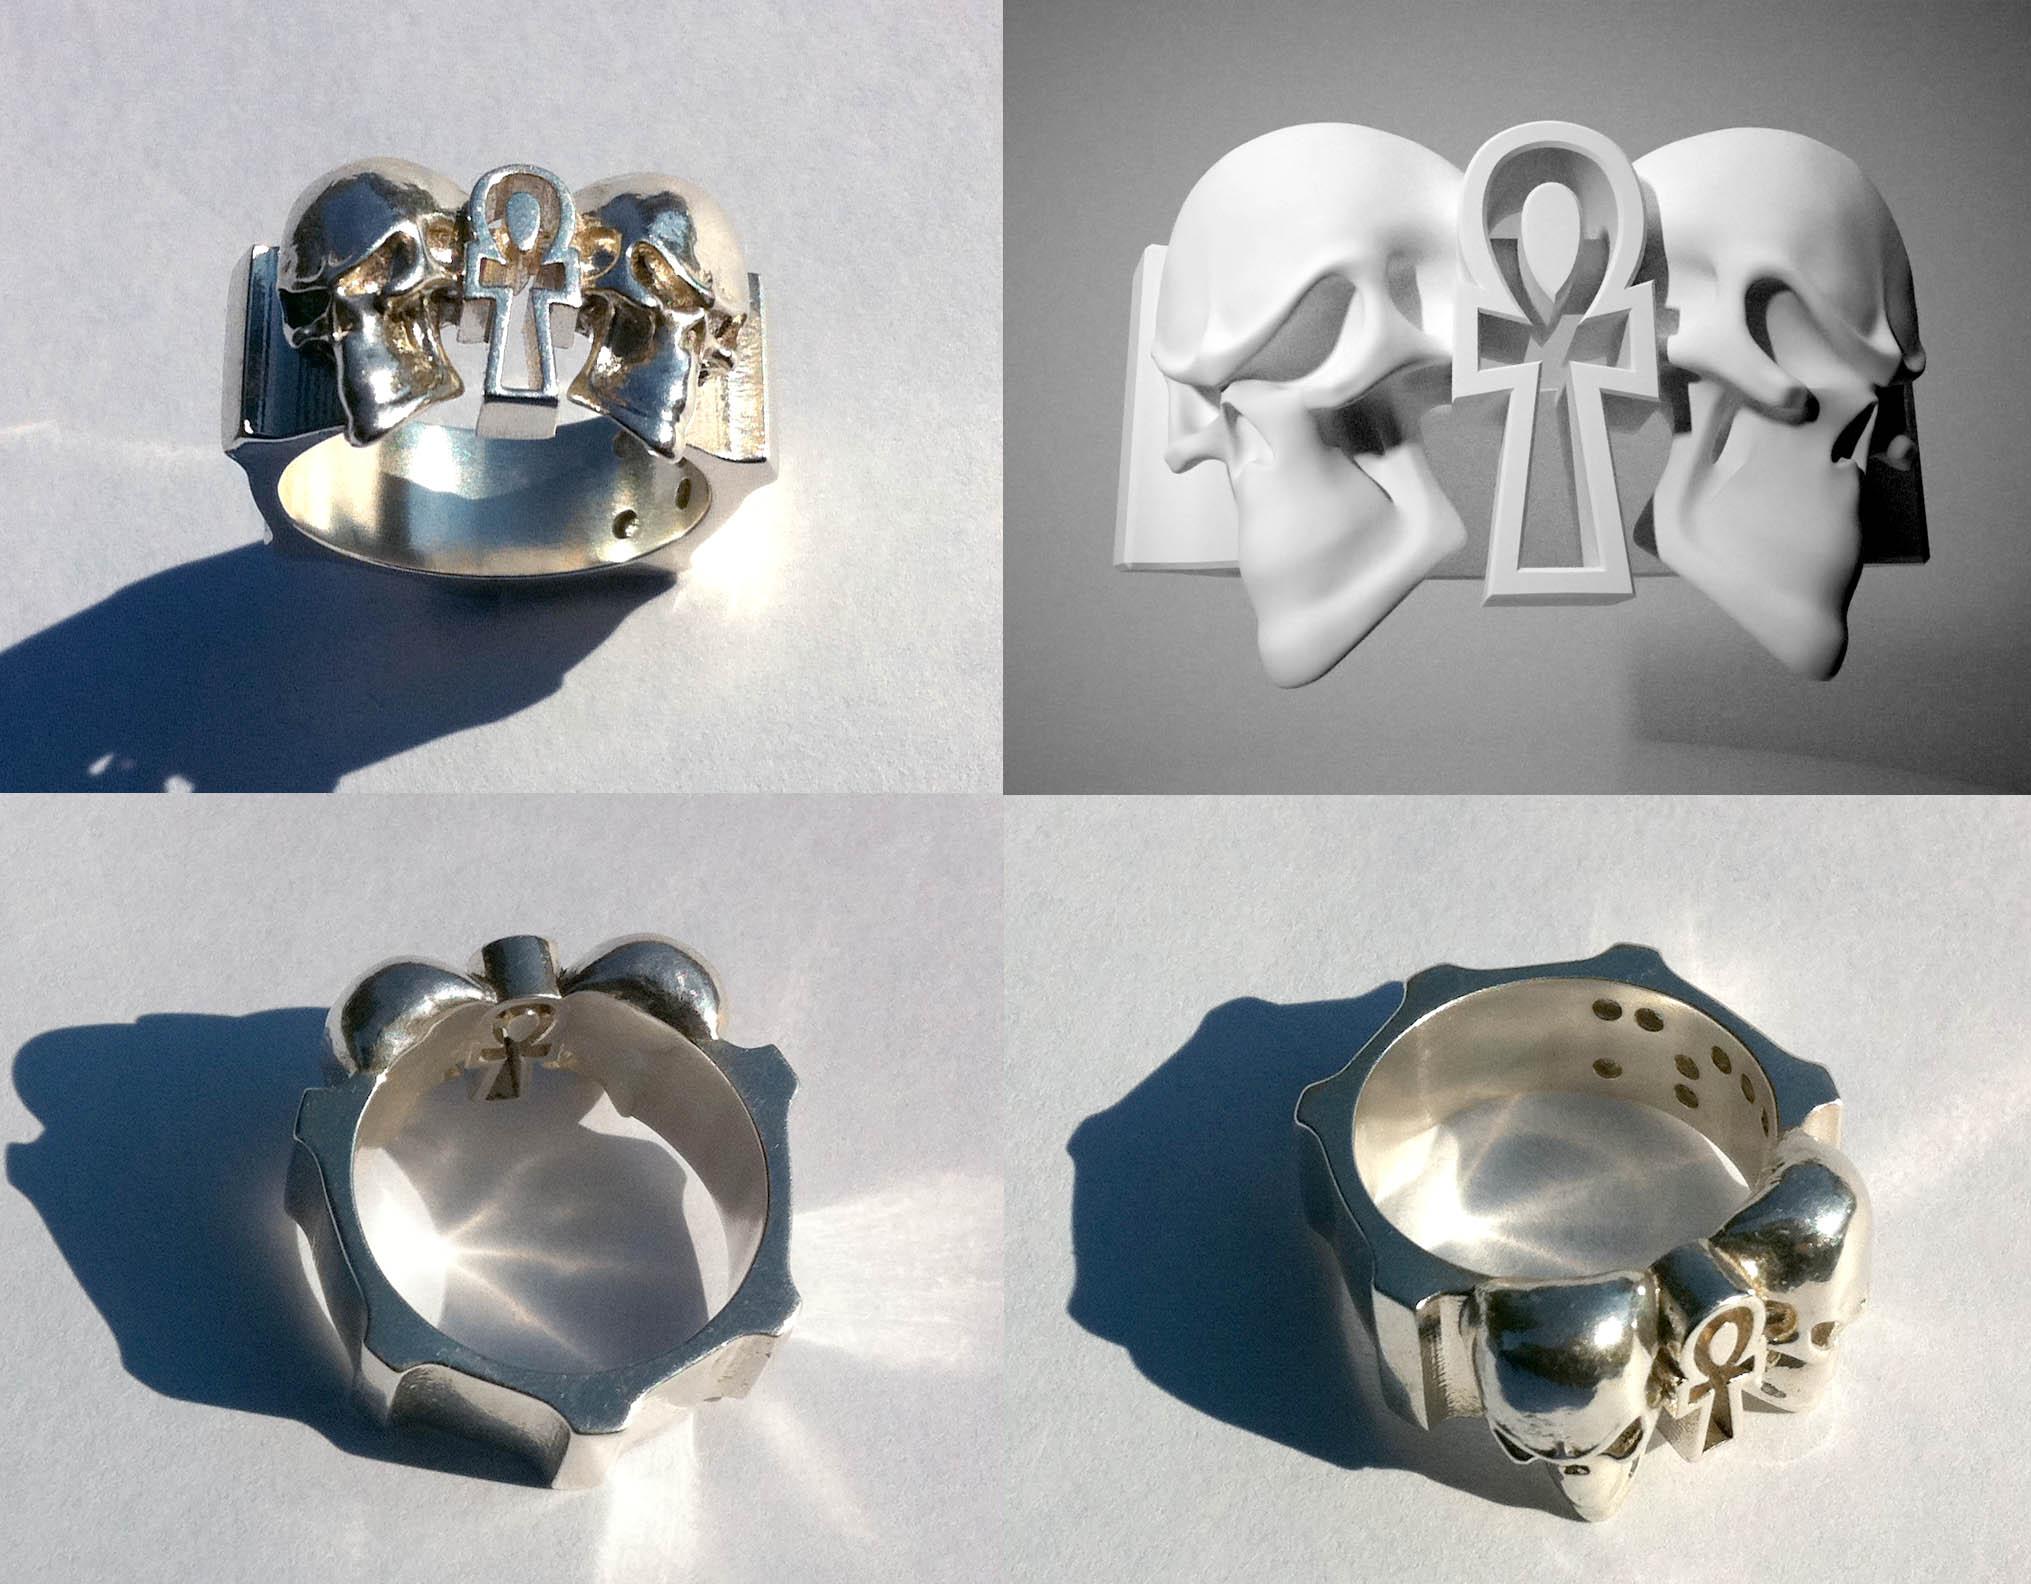 duality_silver_01.jpg